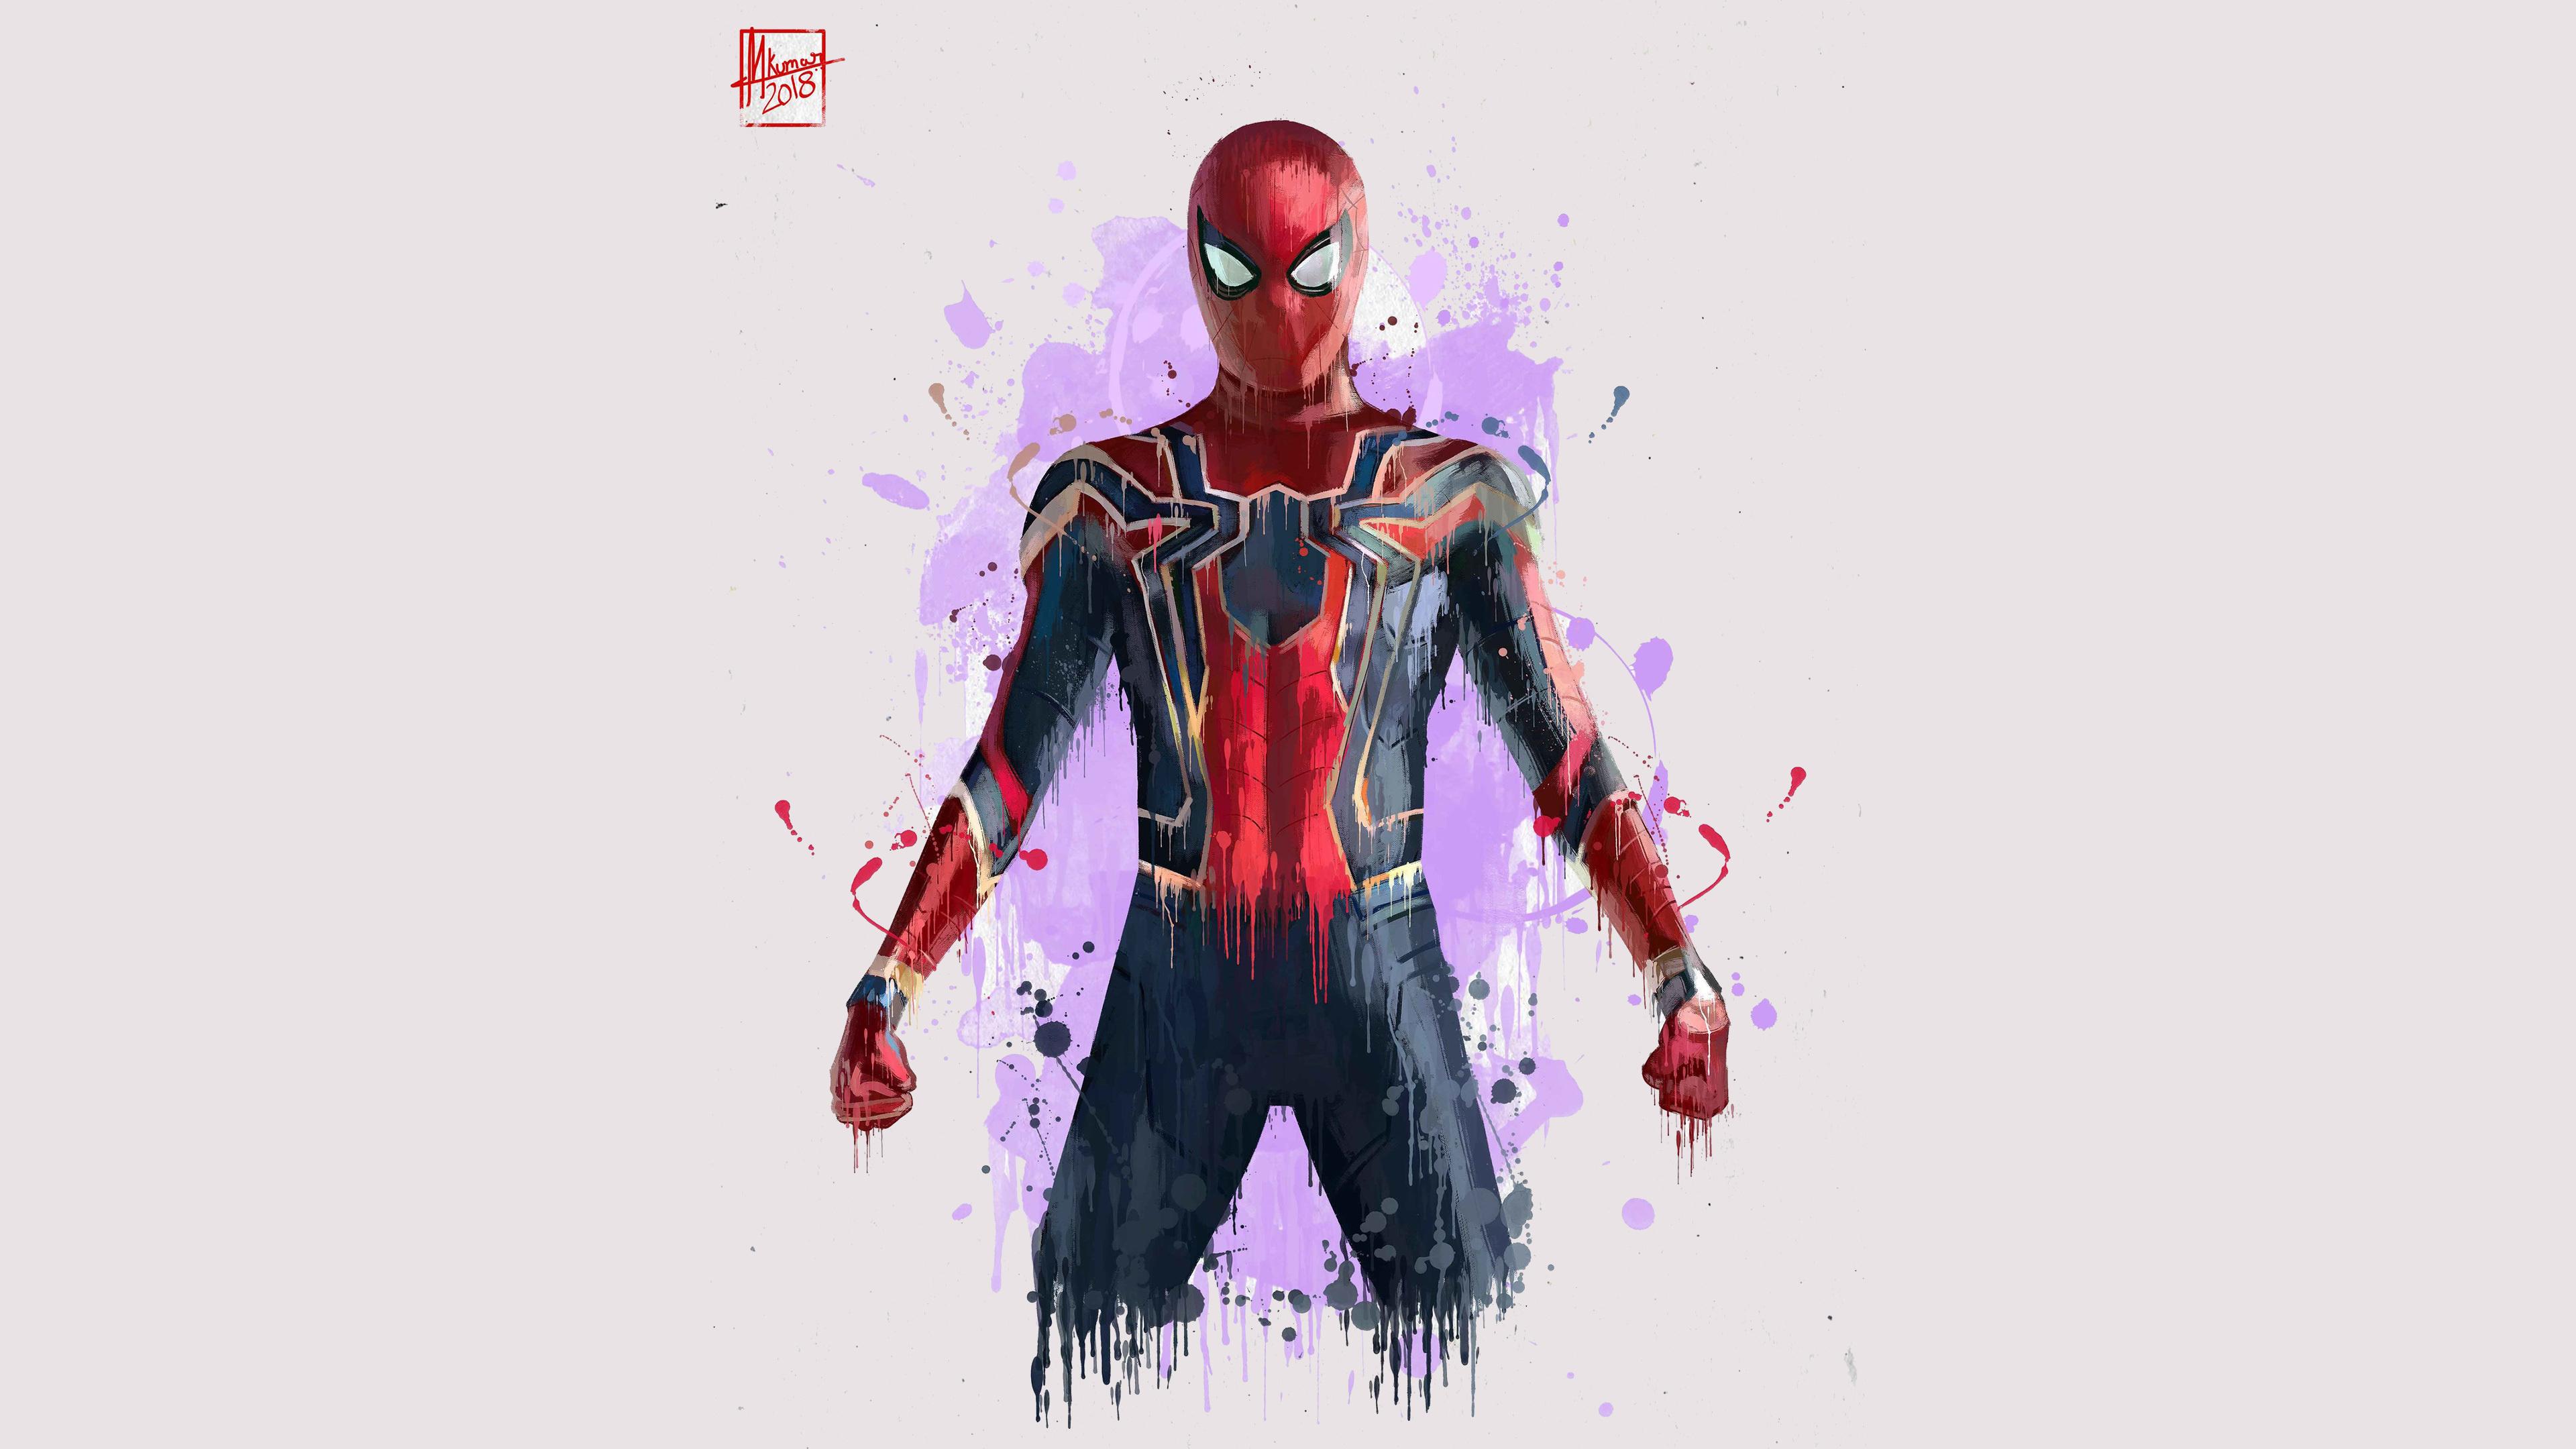 Download 3840x2400 Wallpaper Spiderman Minimal Avengers Infinity